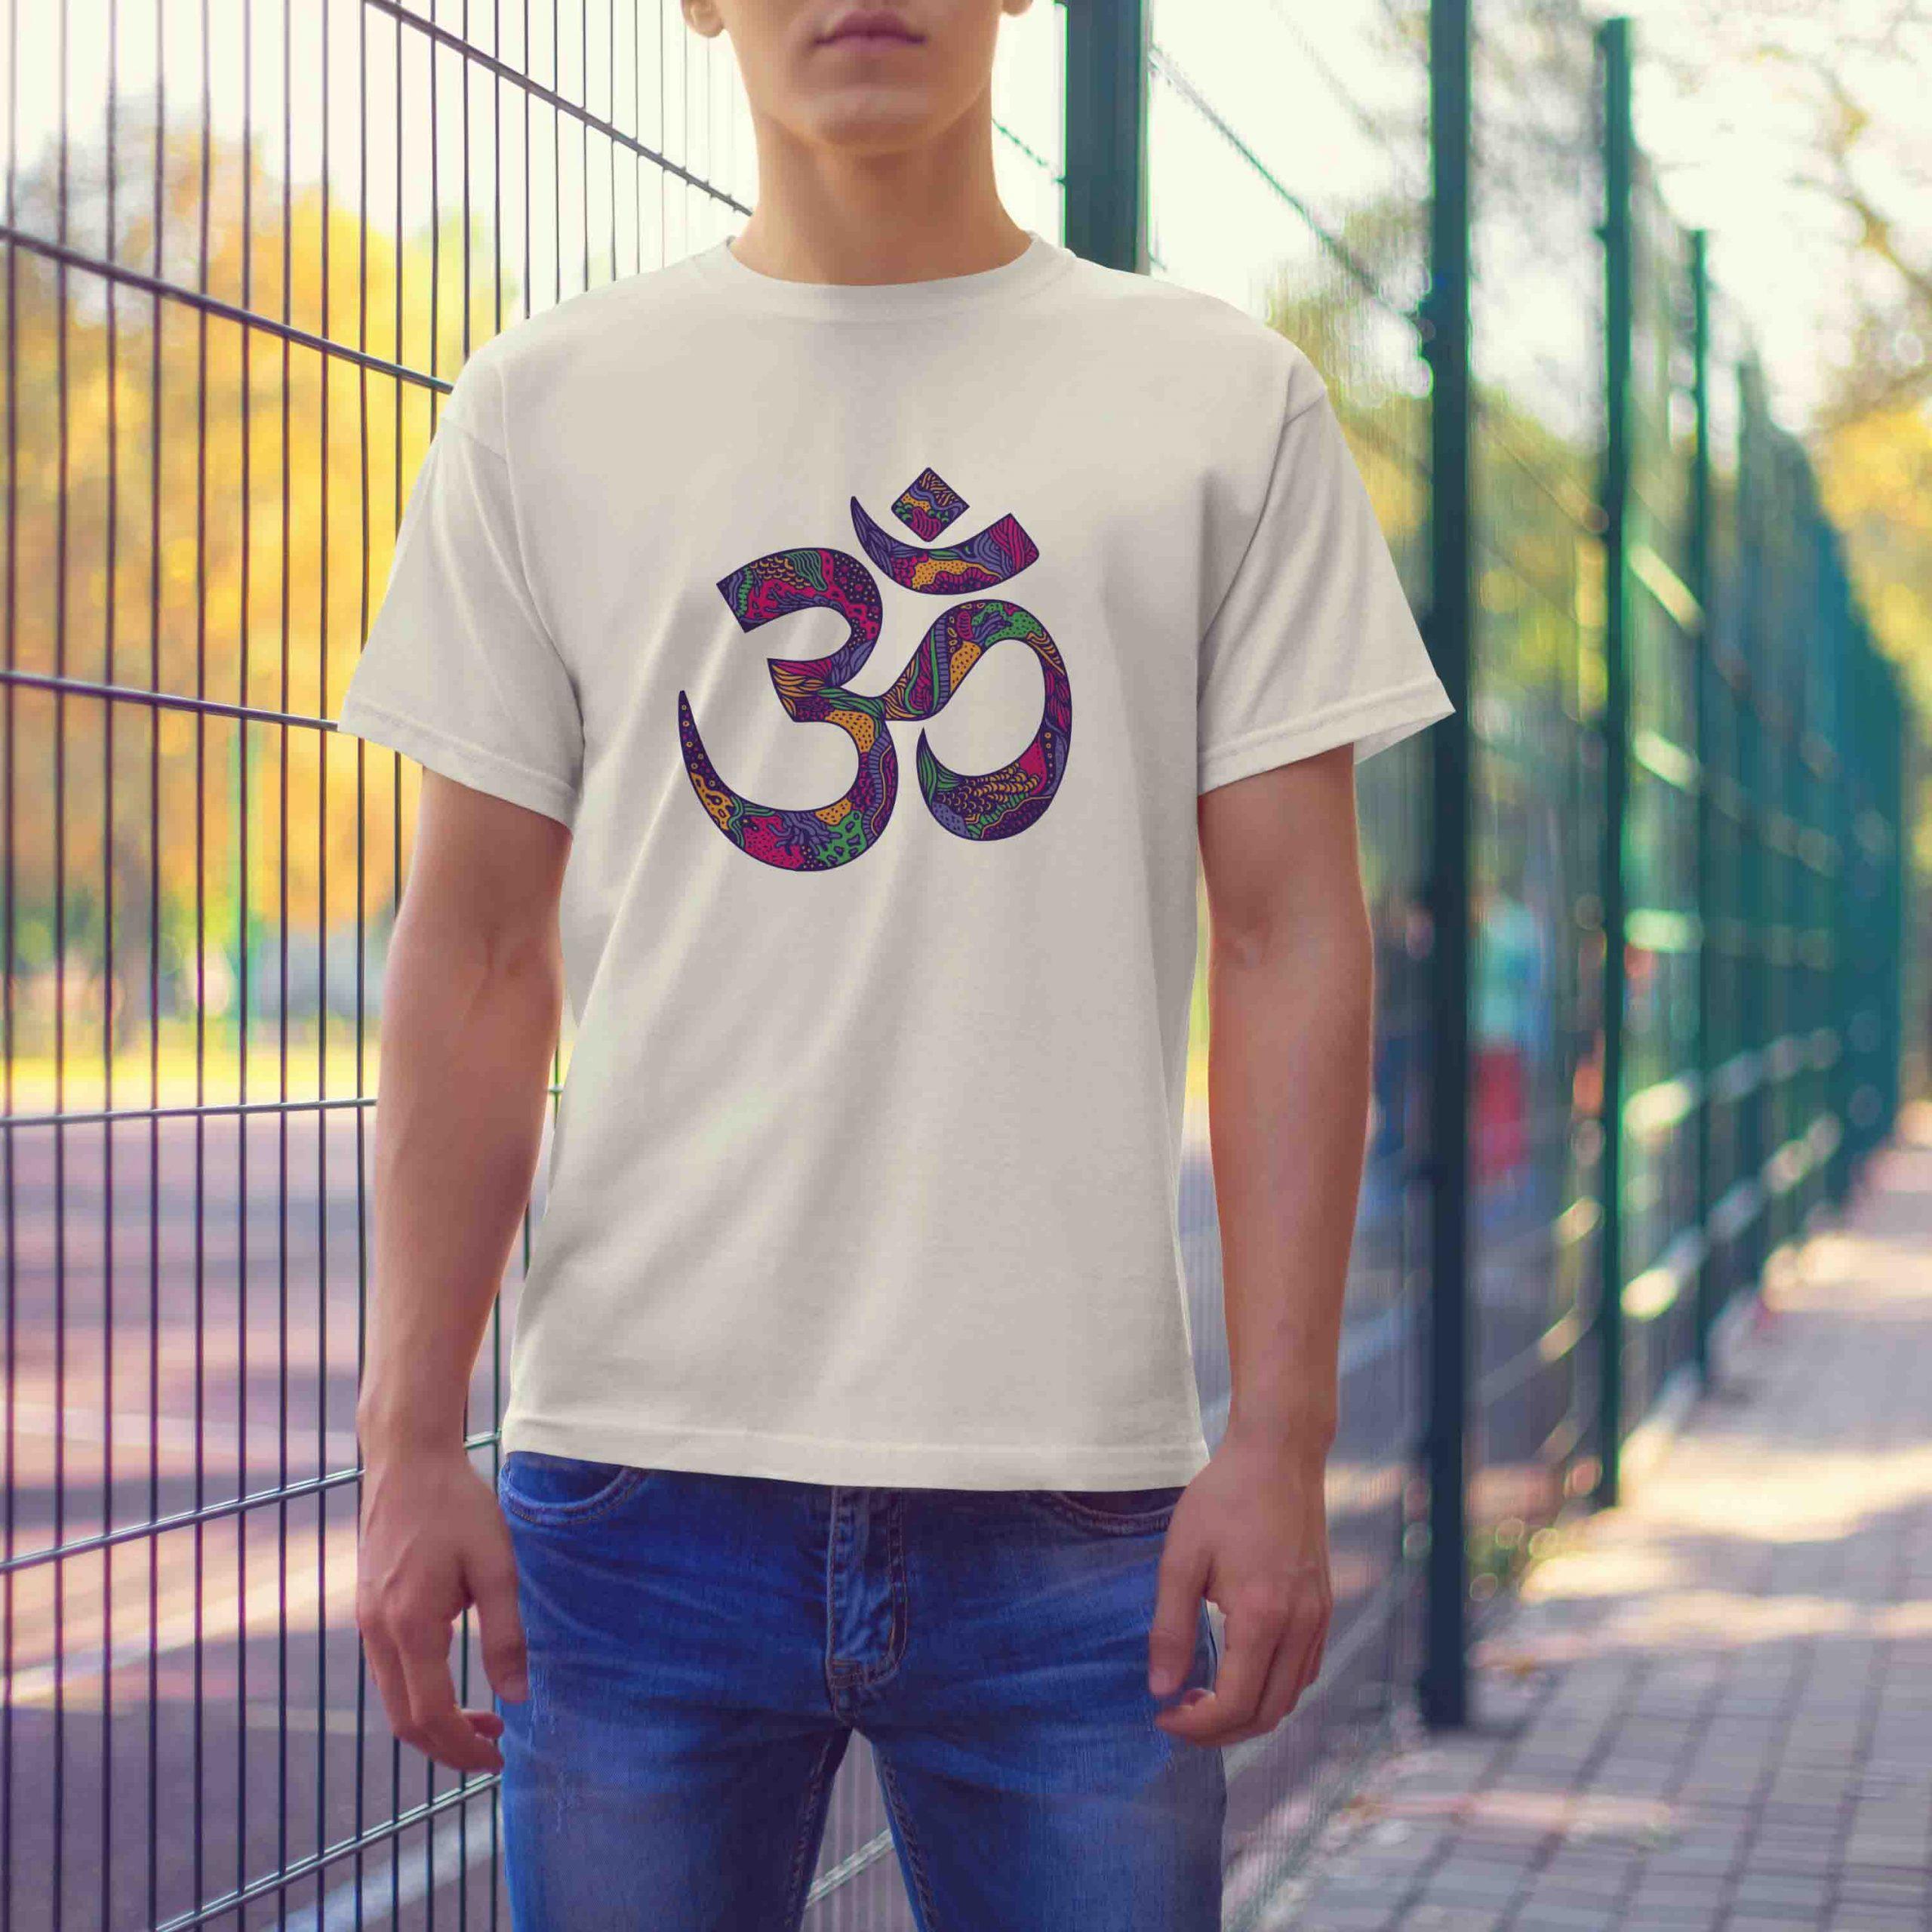 Best Design OM men t-shirt(1)